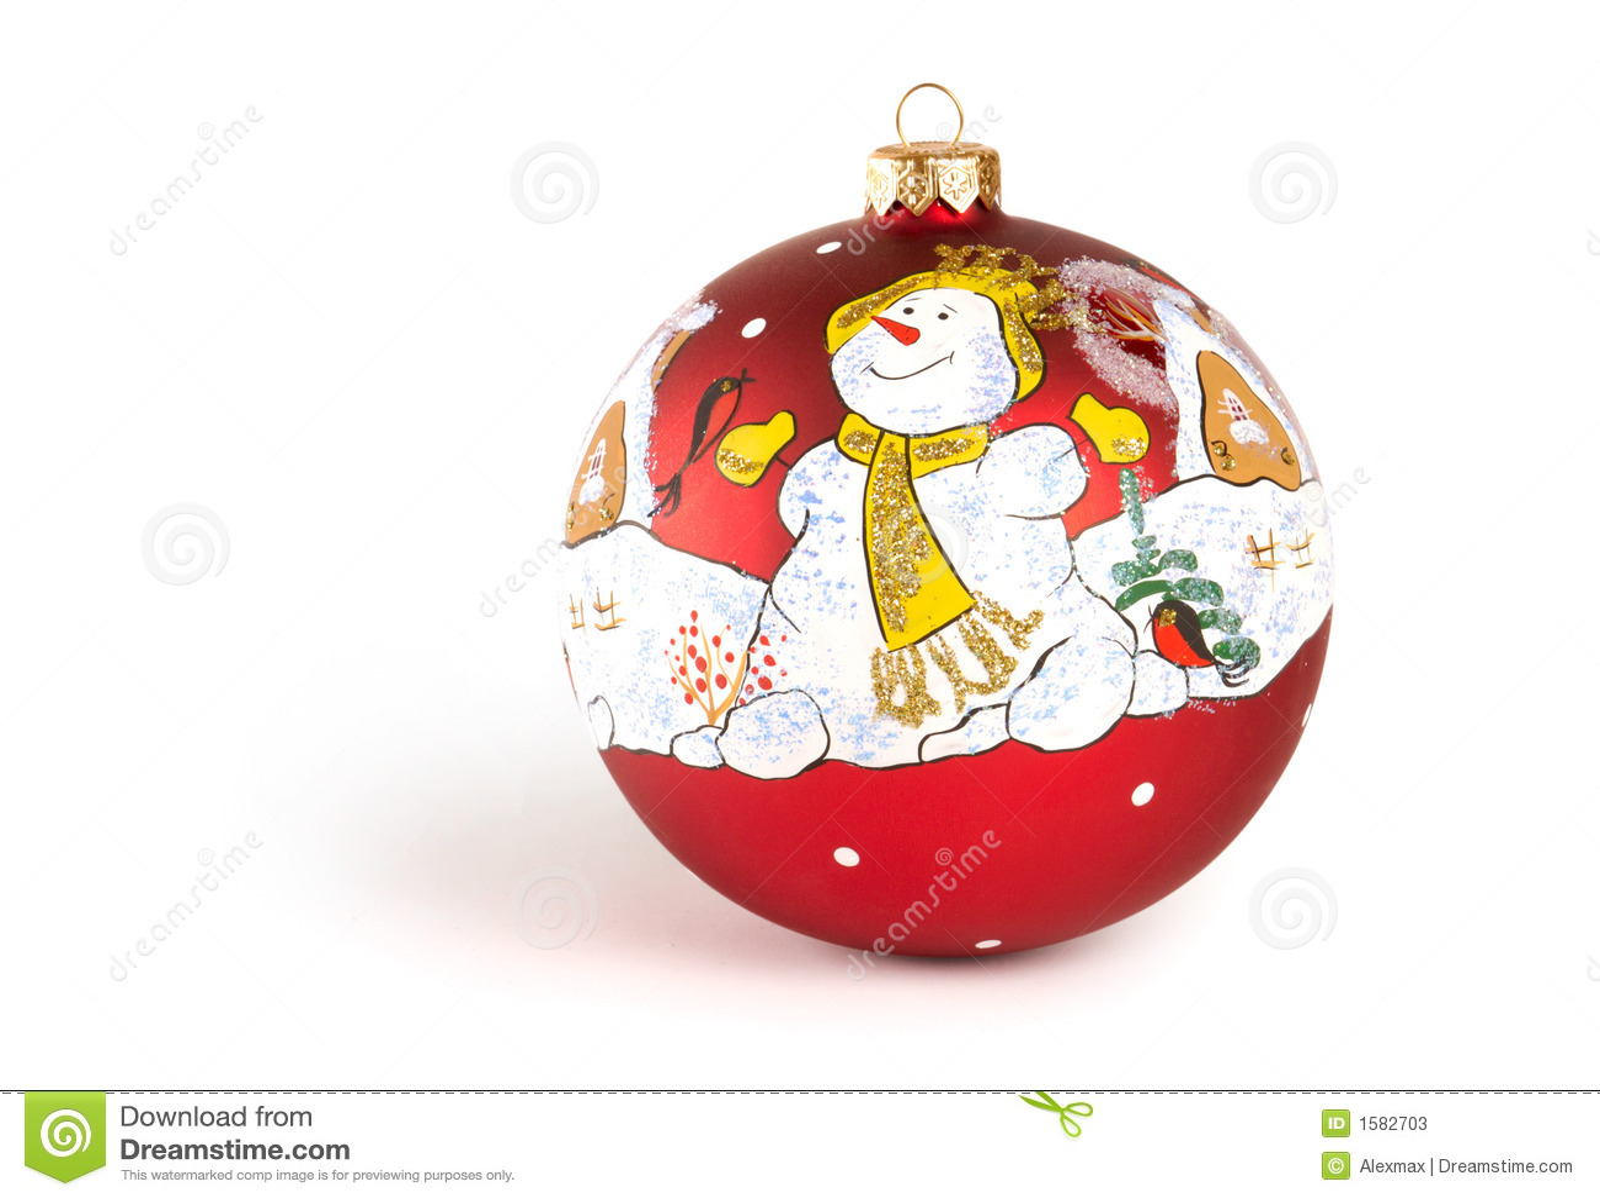 #BDA40E Christmas Decoration Stock Photos Image: 1582703 6361 décoration noel commerce 1300x991 px @ aertt.com